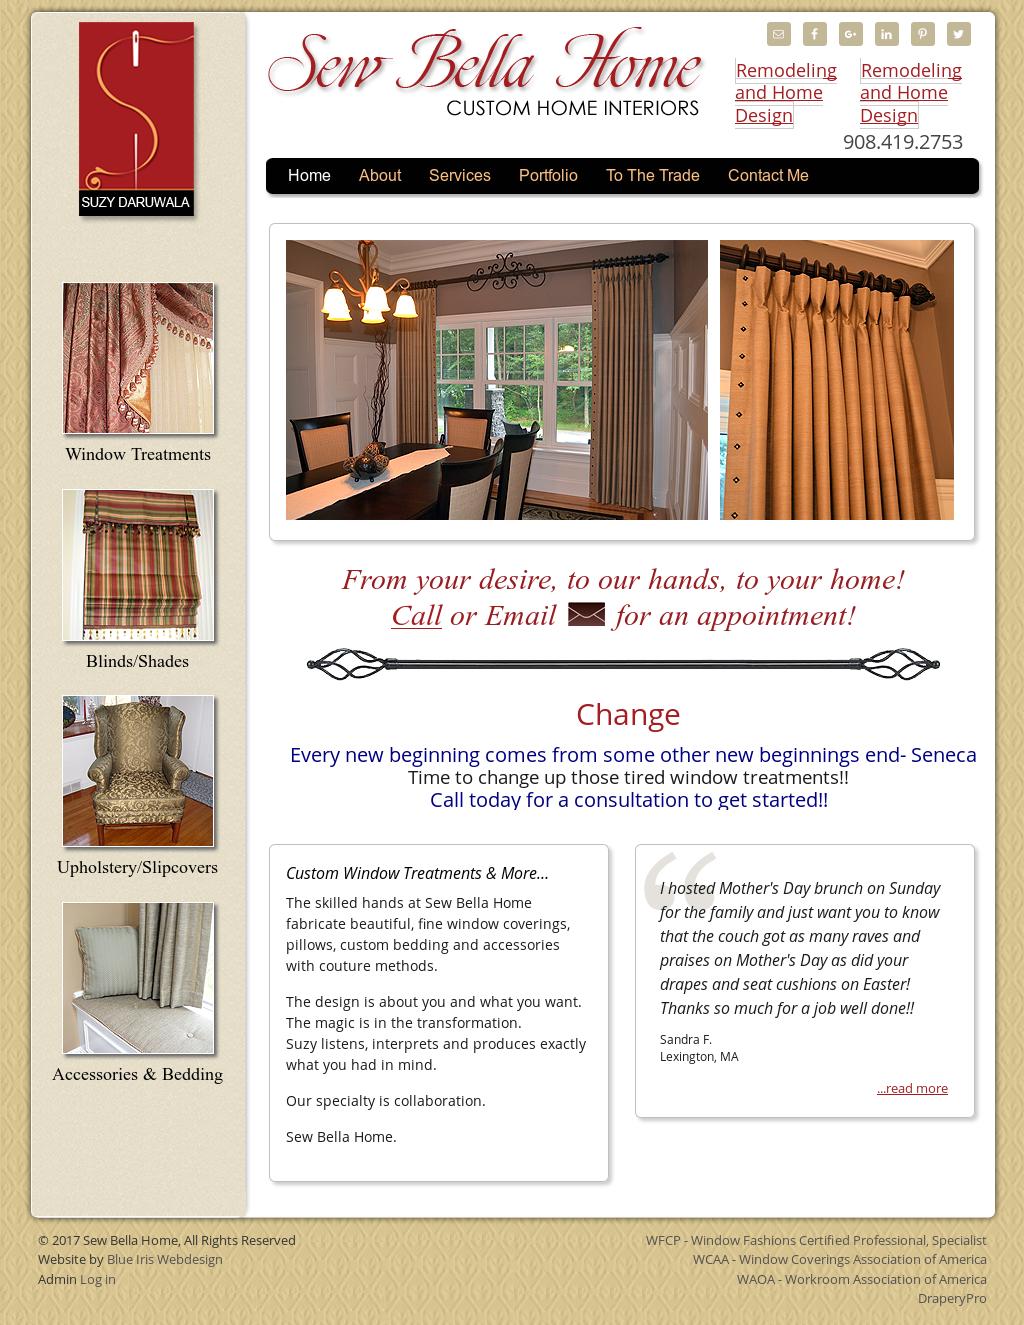 Sew Bella Home Website History